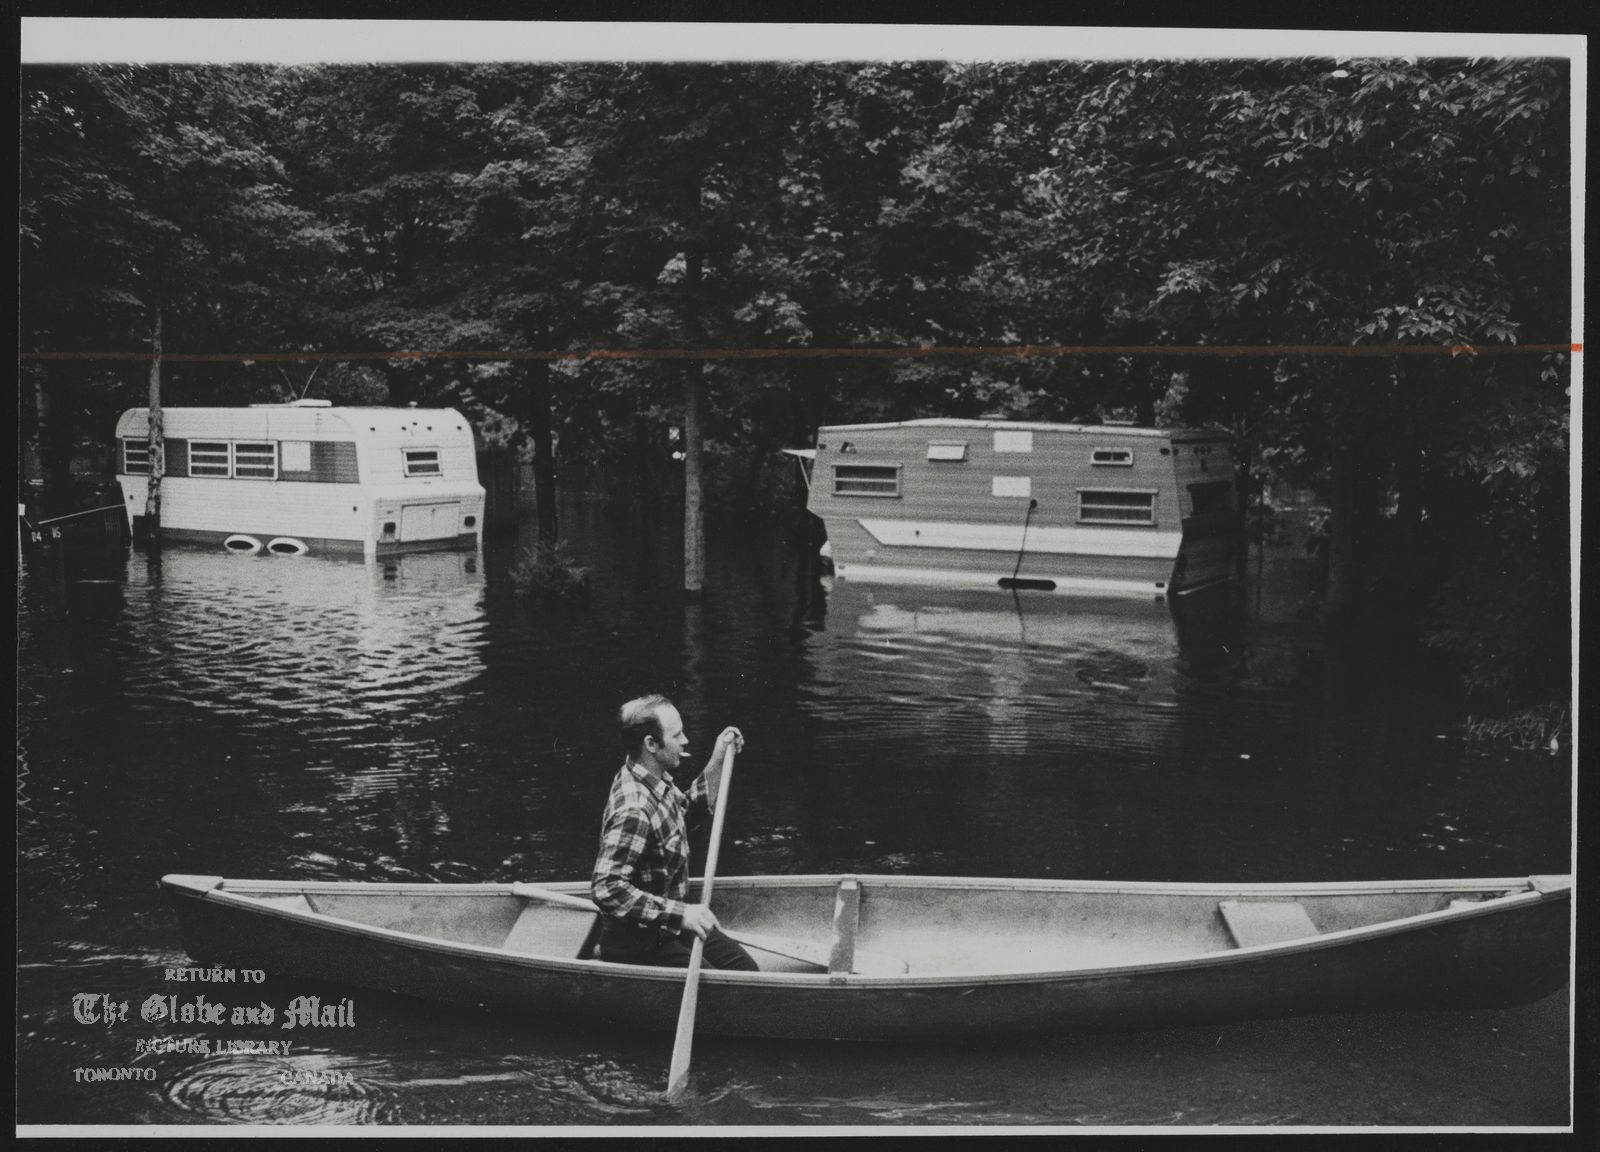 FLOODS Canada Allan McCutcheon canoes through Silver Sand Trailer Park, Huntsville.